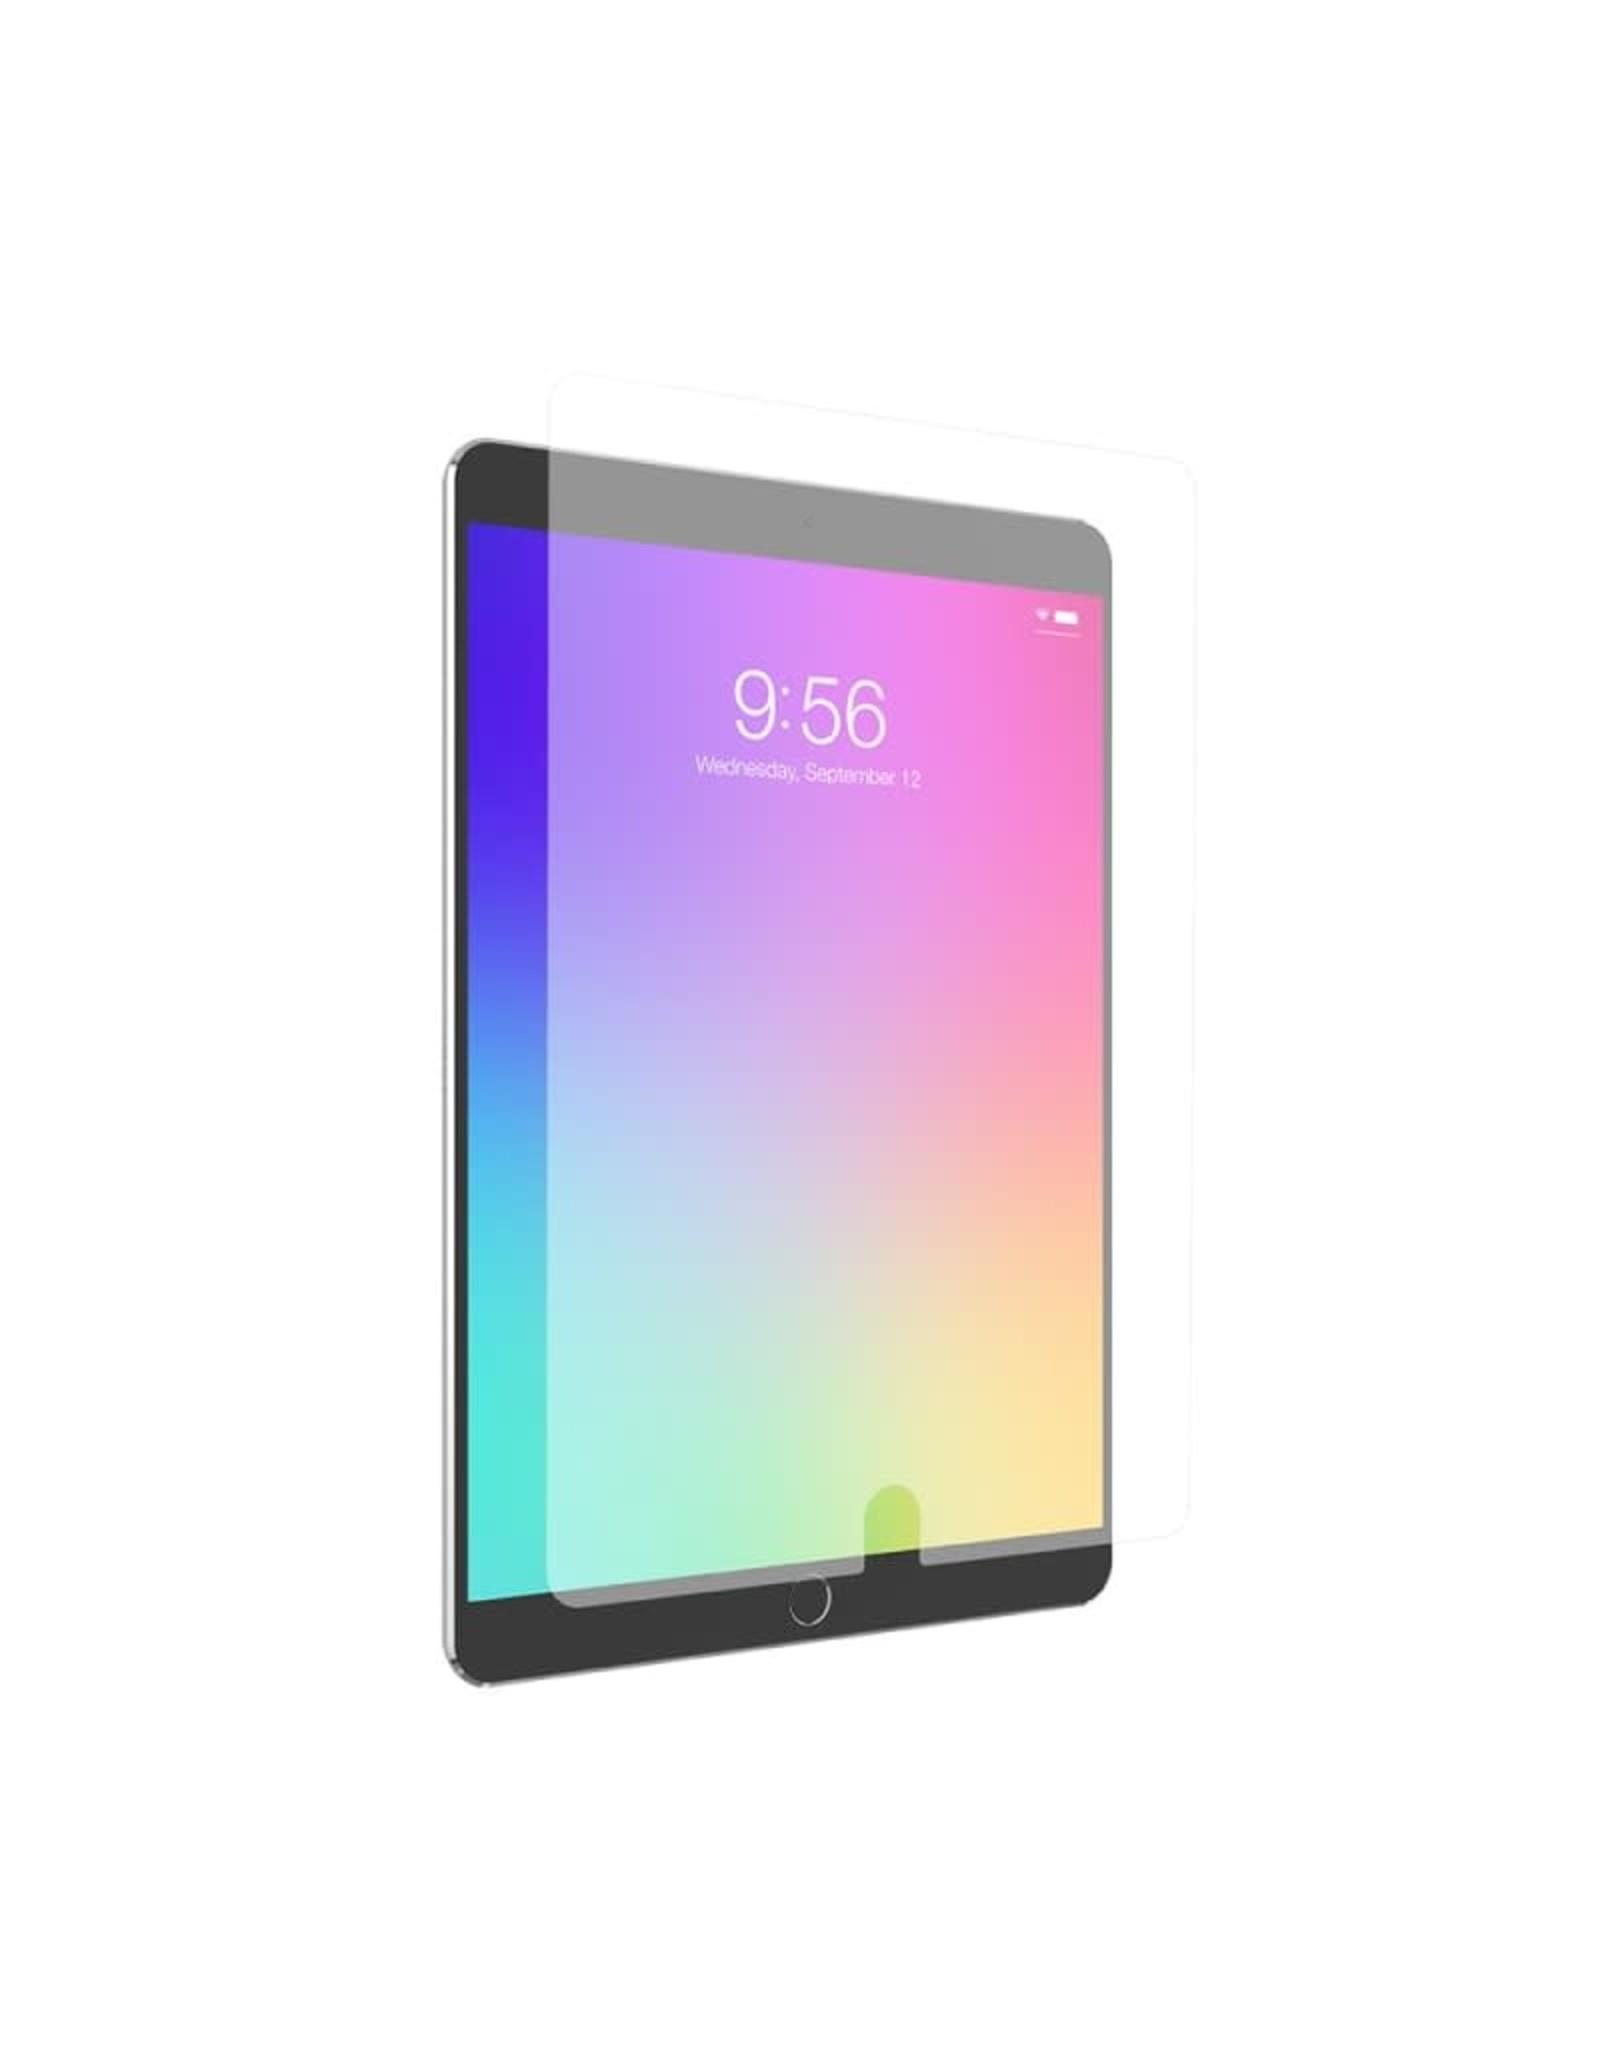 Zagg Zagg InvisibleShield Glass+ suits iPad iPad Air/Air 2, iPad Pro 9.7, iPad 2017/2018 - VisionGuard